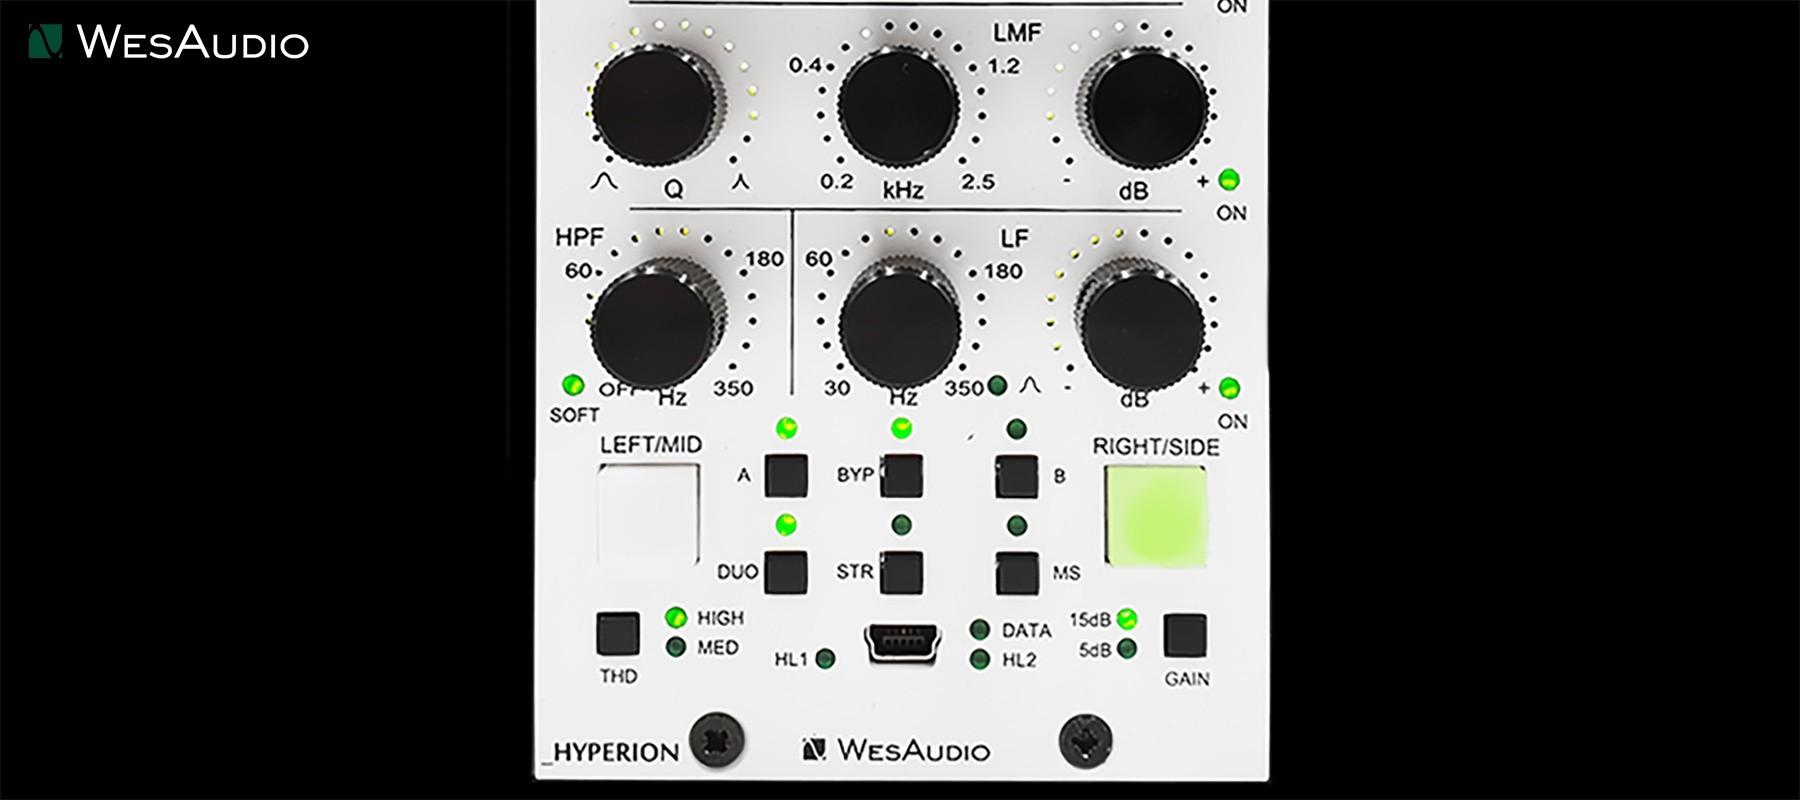 WesAudio Hyperion